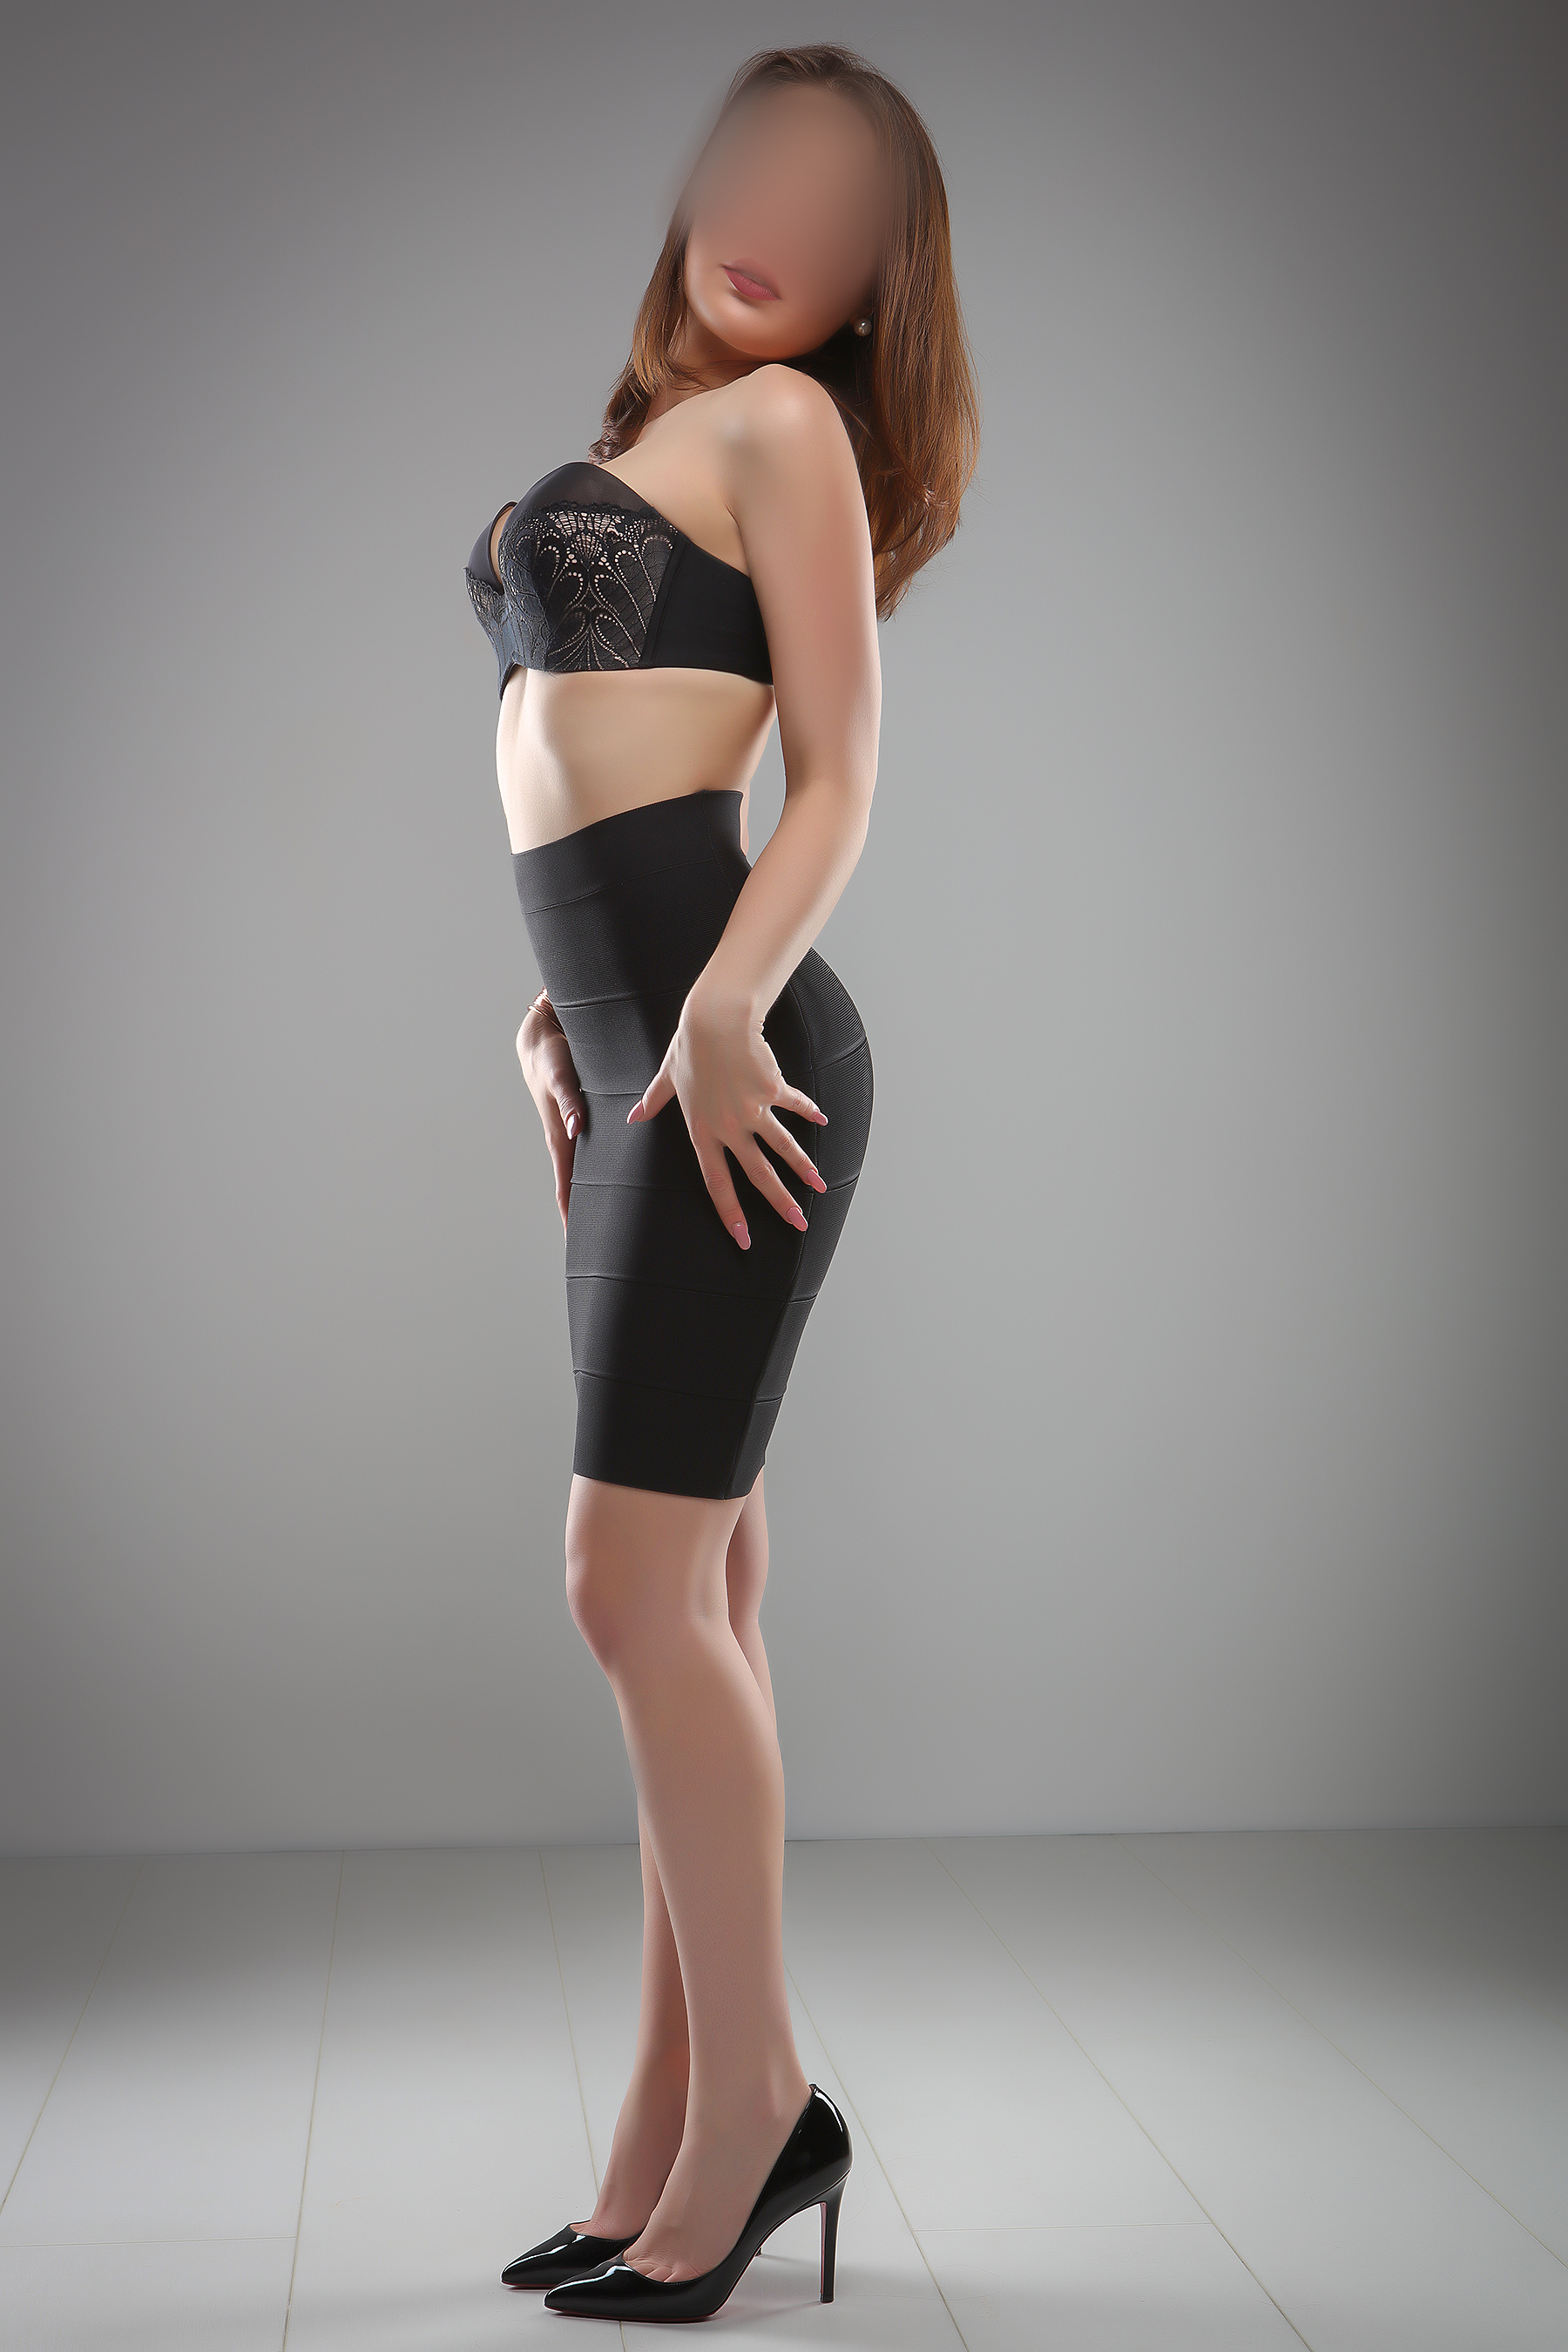 prono sex agence escorte